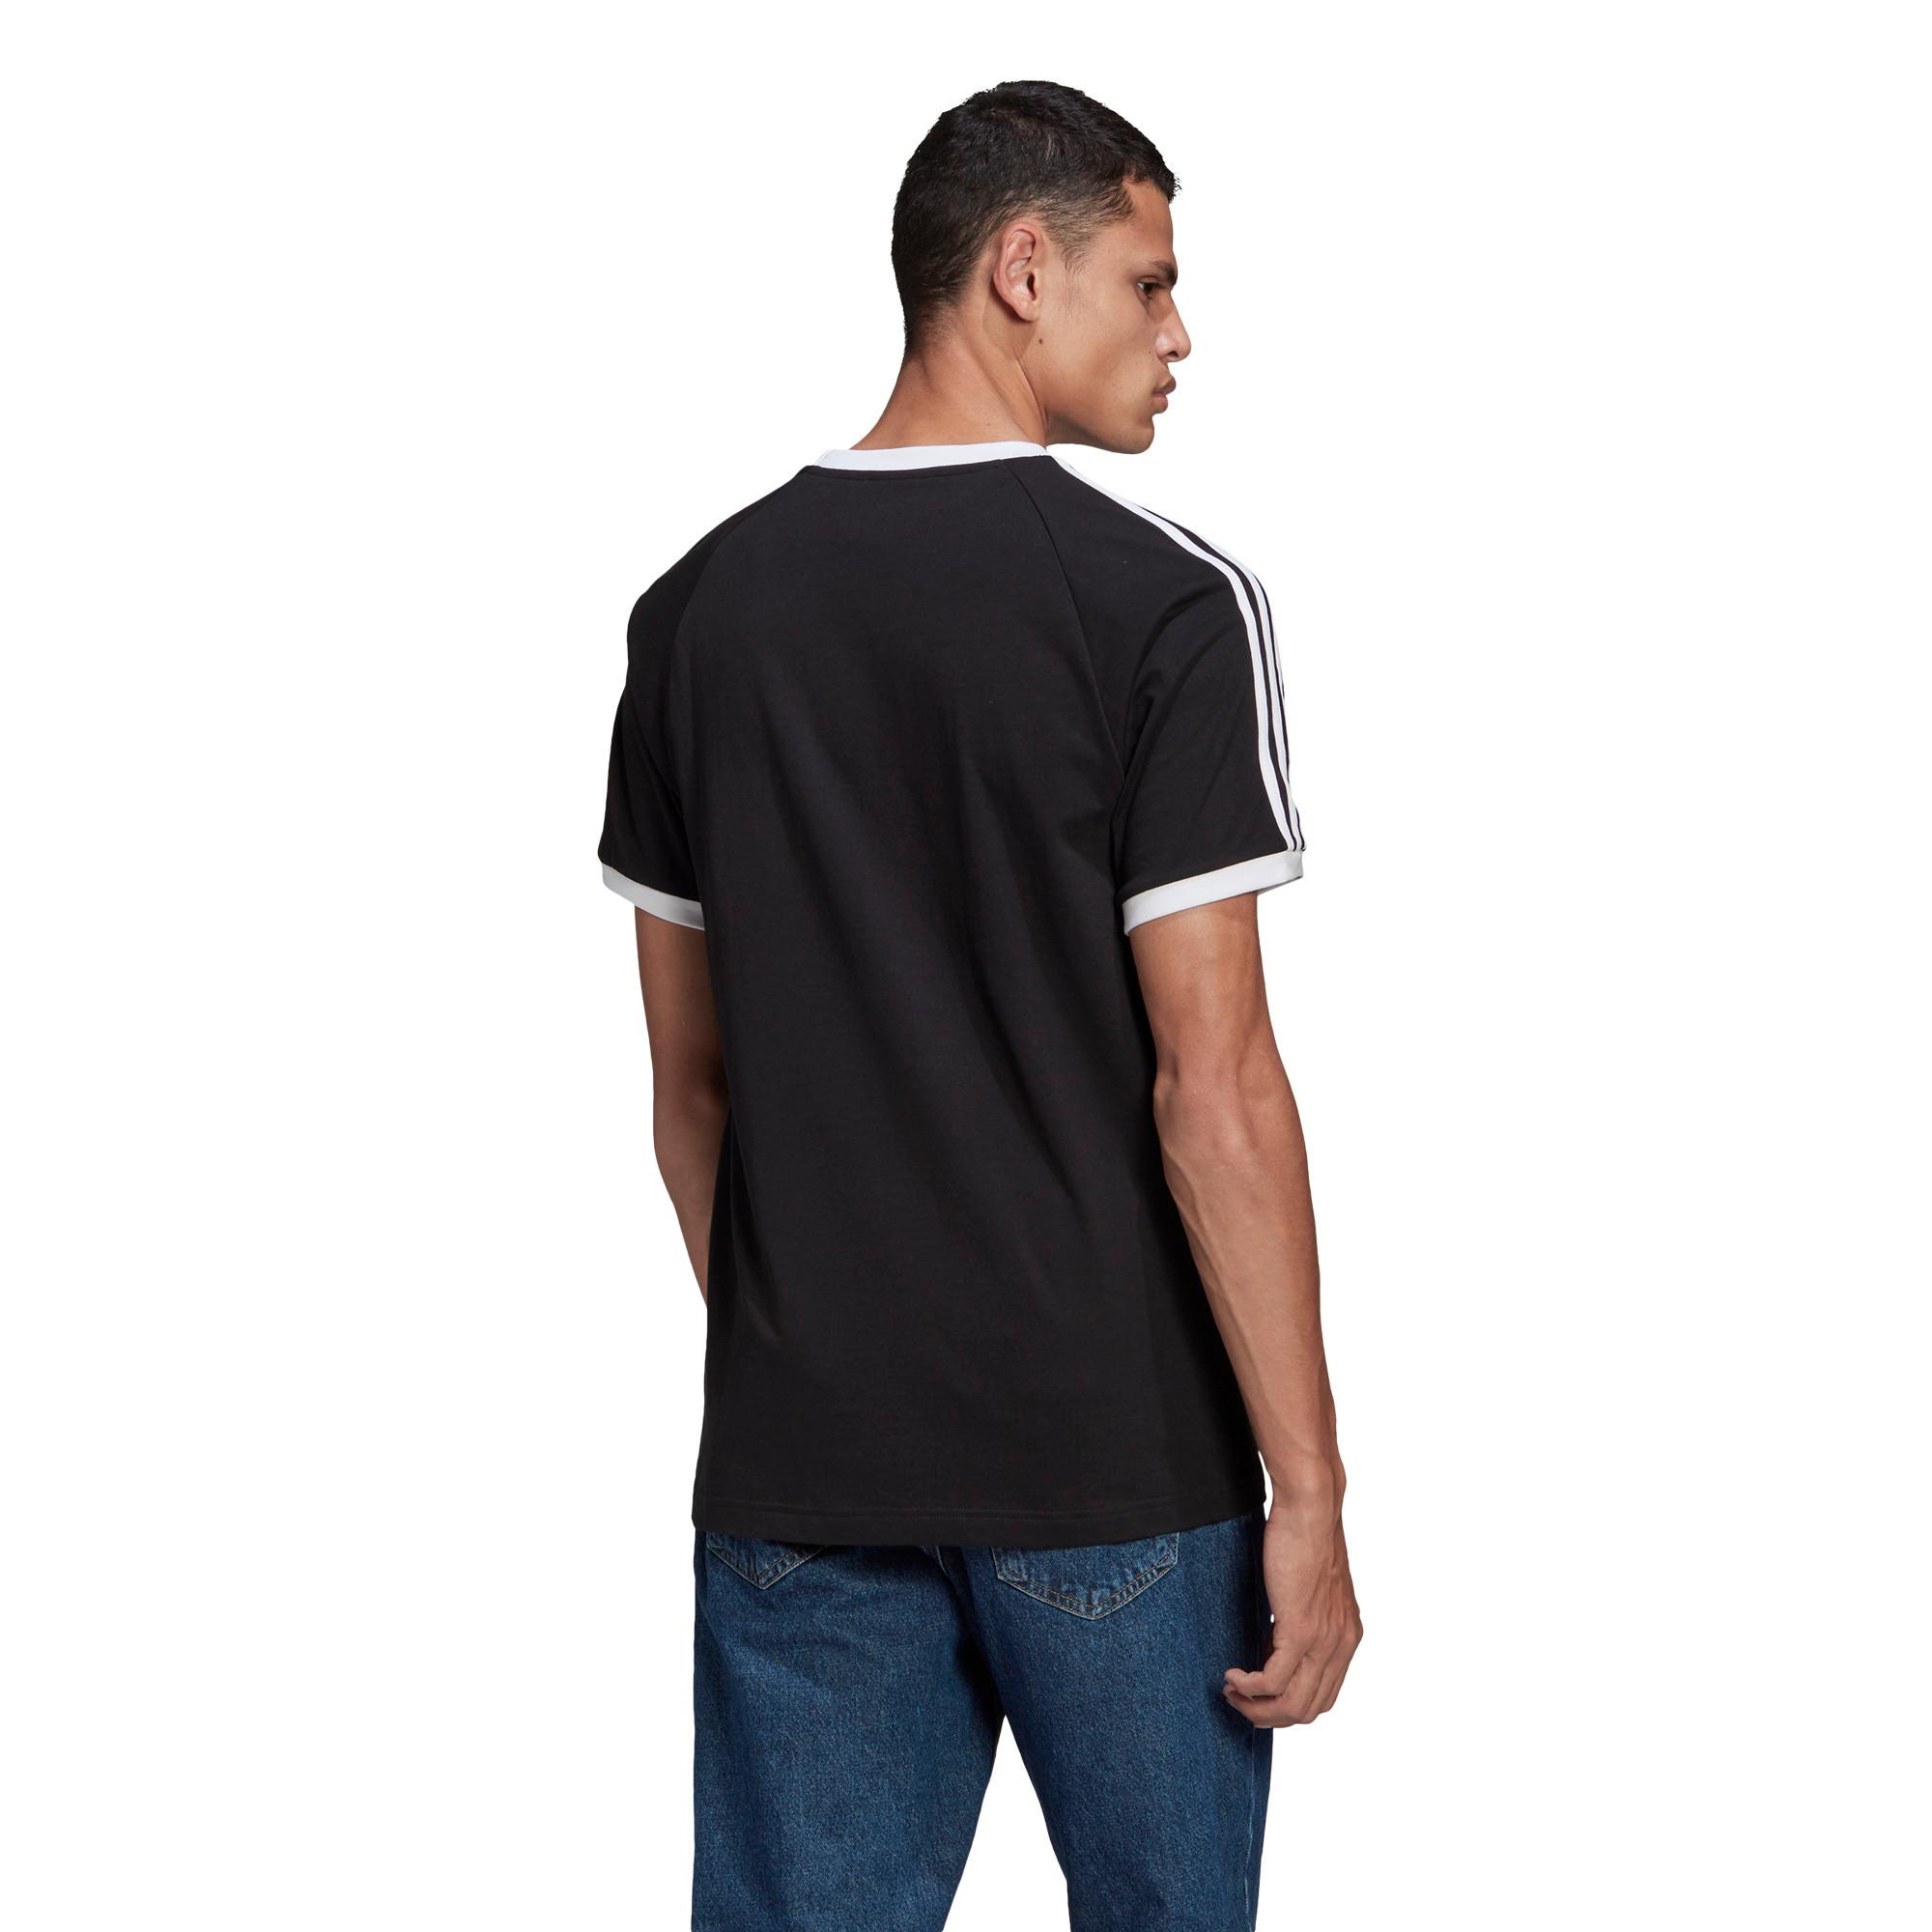 T-Shirt Adicolor Classics 3-Stripes, Nero, large image number 1